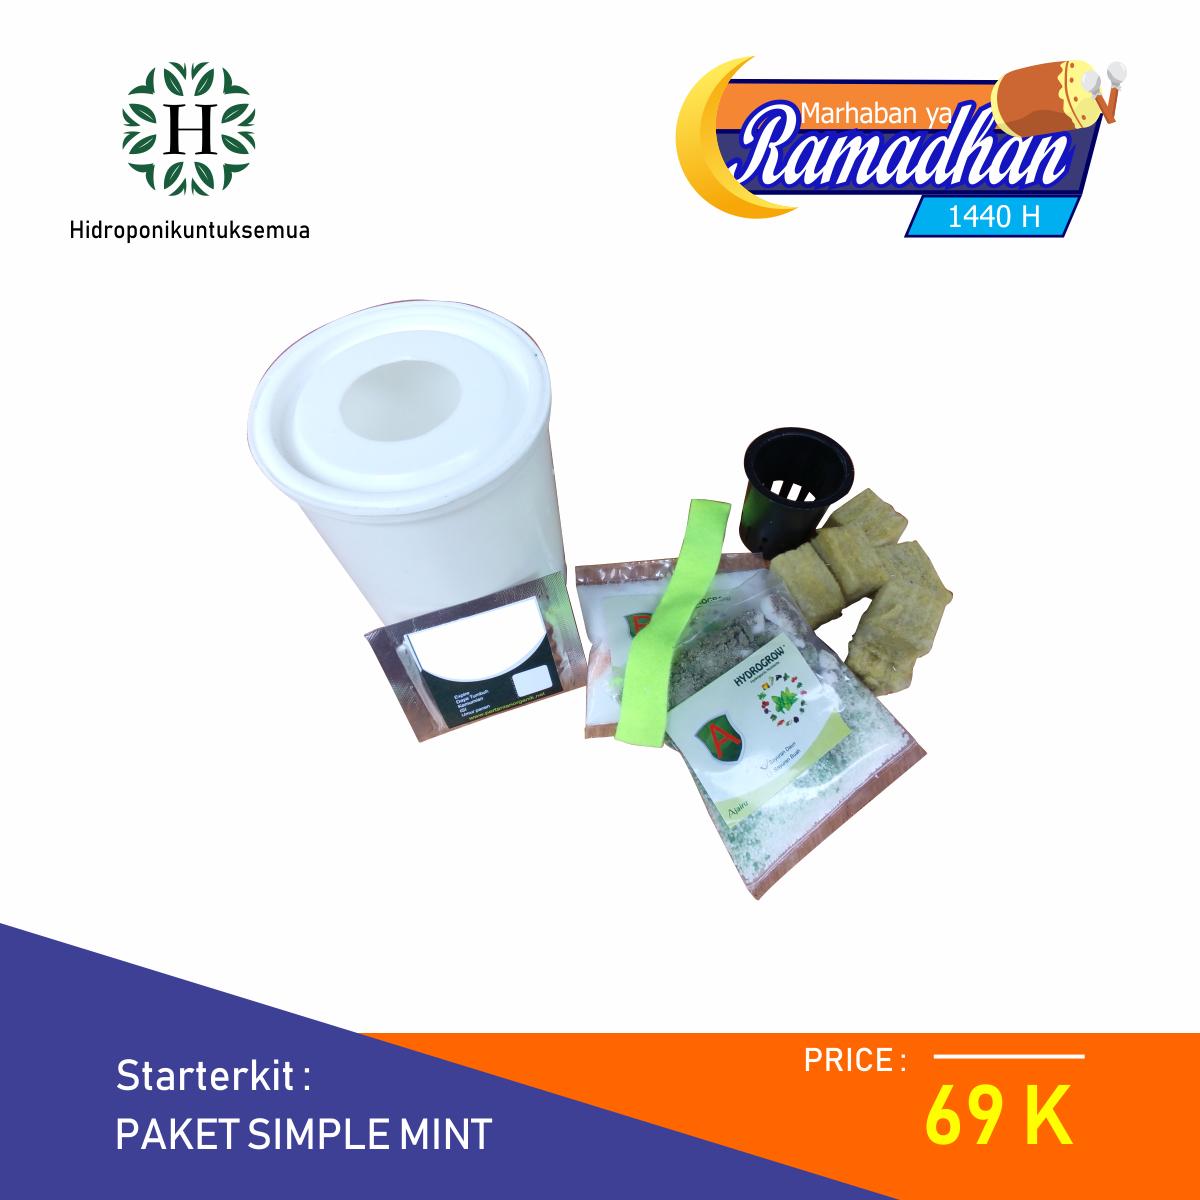 Paket Simple Mint